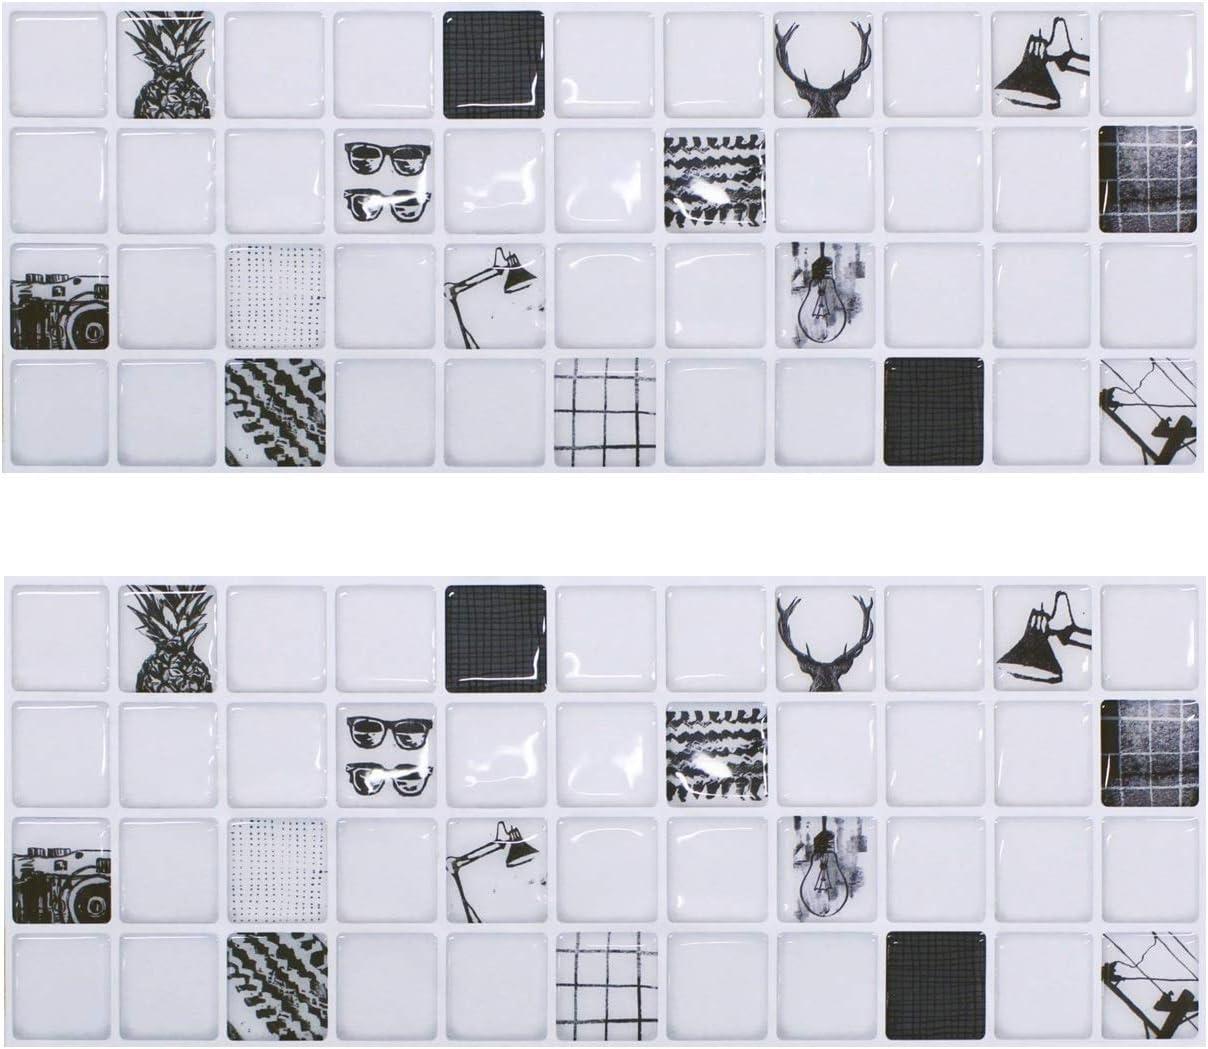 Beaustile Mosaic 3D Wall Sticker Home Decor Vintage Fire Retardant Backsplash Wallpaper Bathroom Kitchen DIY Design